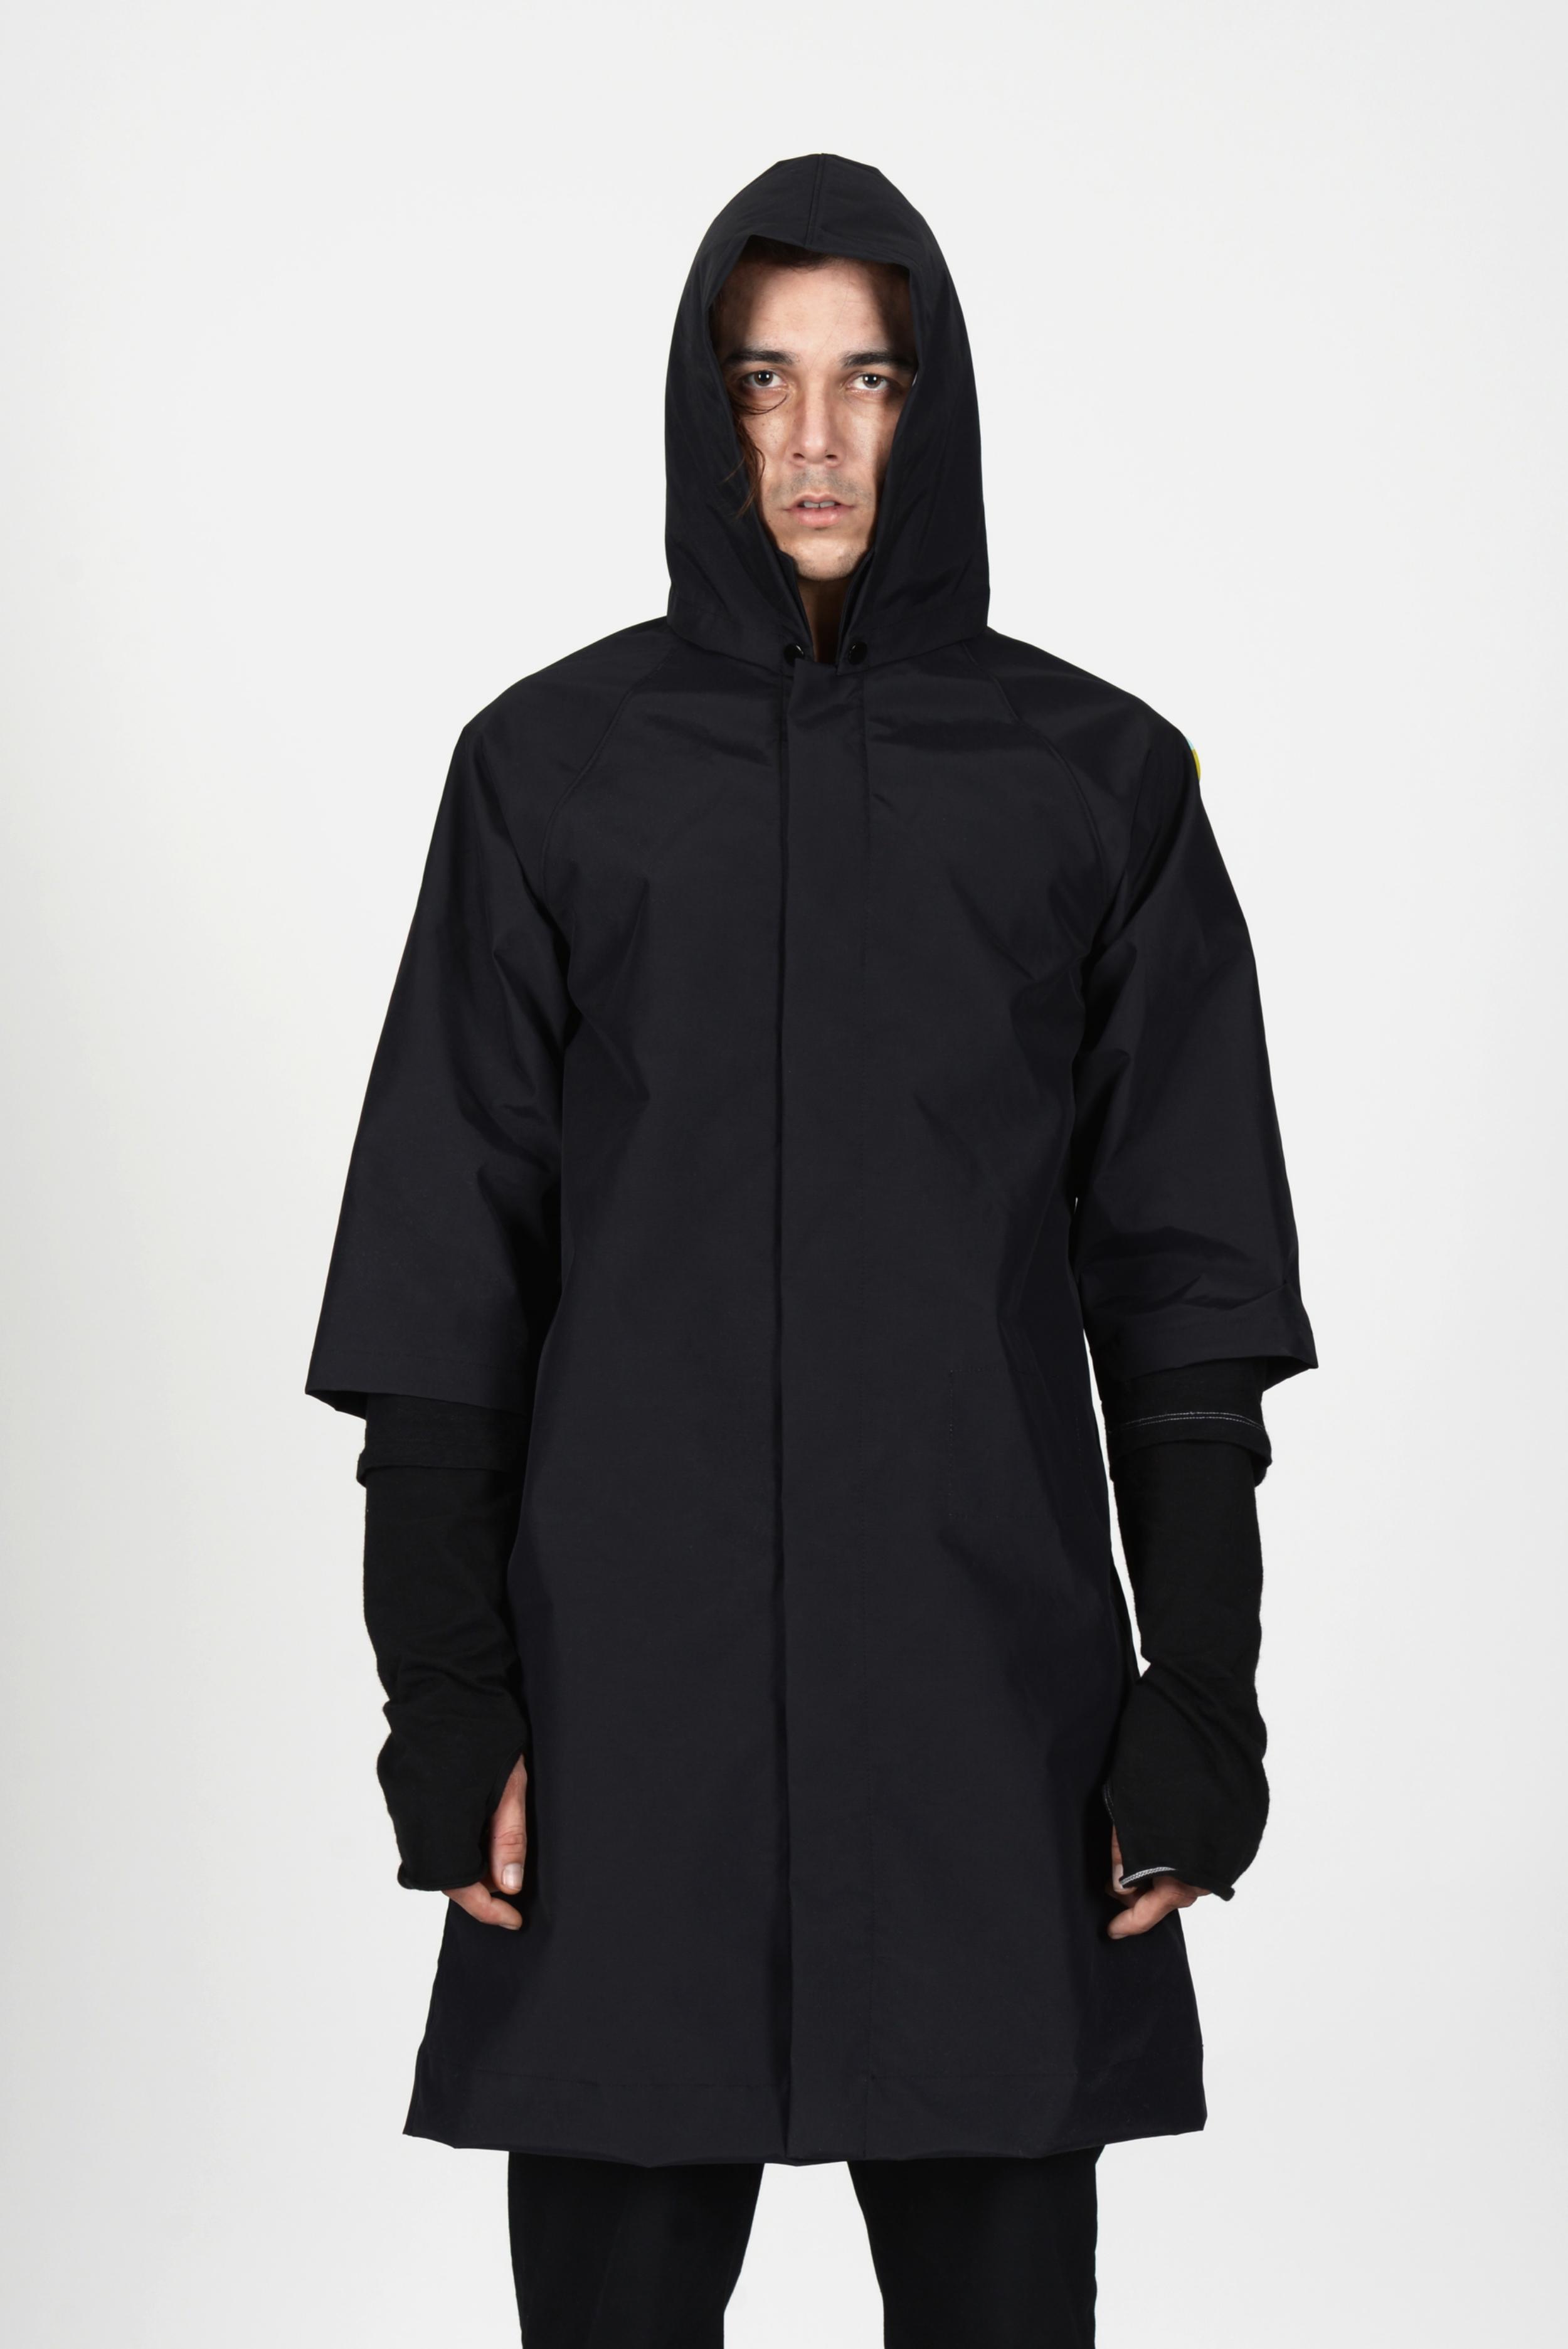 02 Heightened Sense Black Dragon Coat.jpg